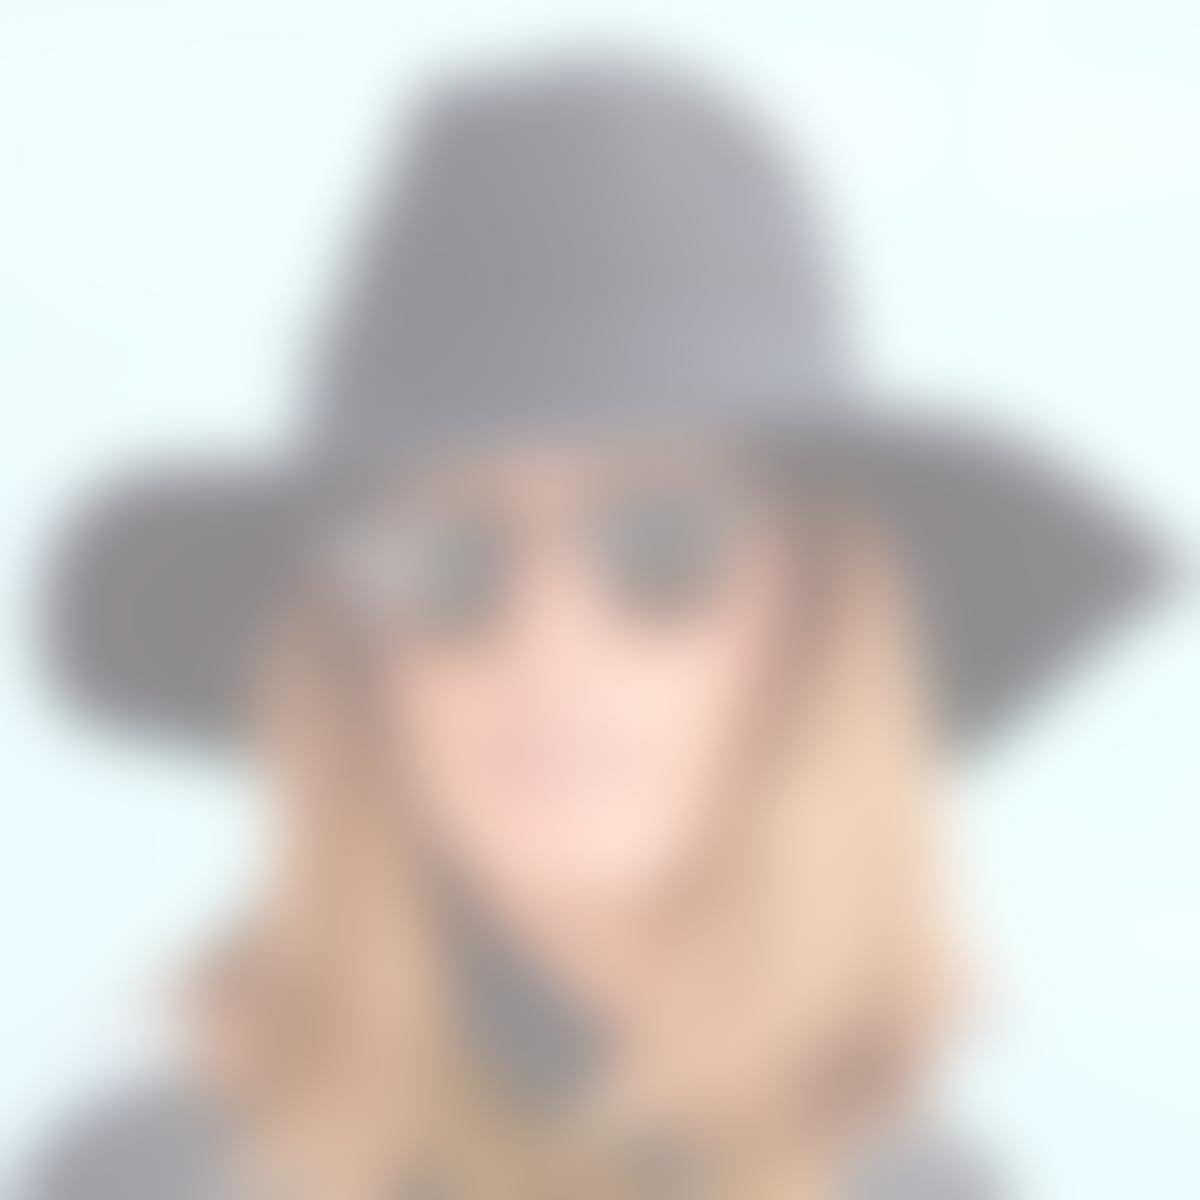 Amazon.com: RACEU ATELIER Black Queen Hat - Wide Brim Fedora Hat - 100% Wool Felt - Fedoras & Trilby Hats - for Women: Handmade